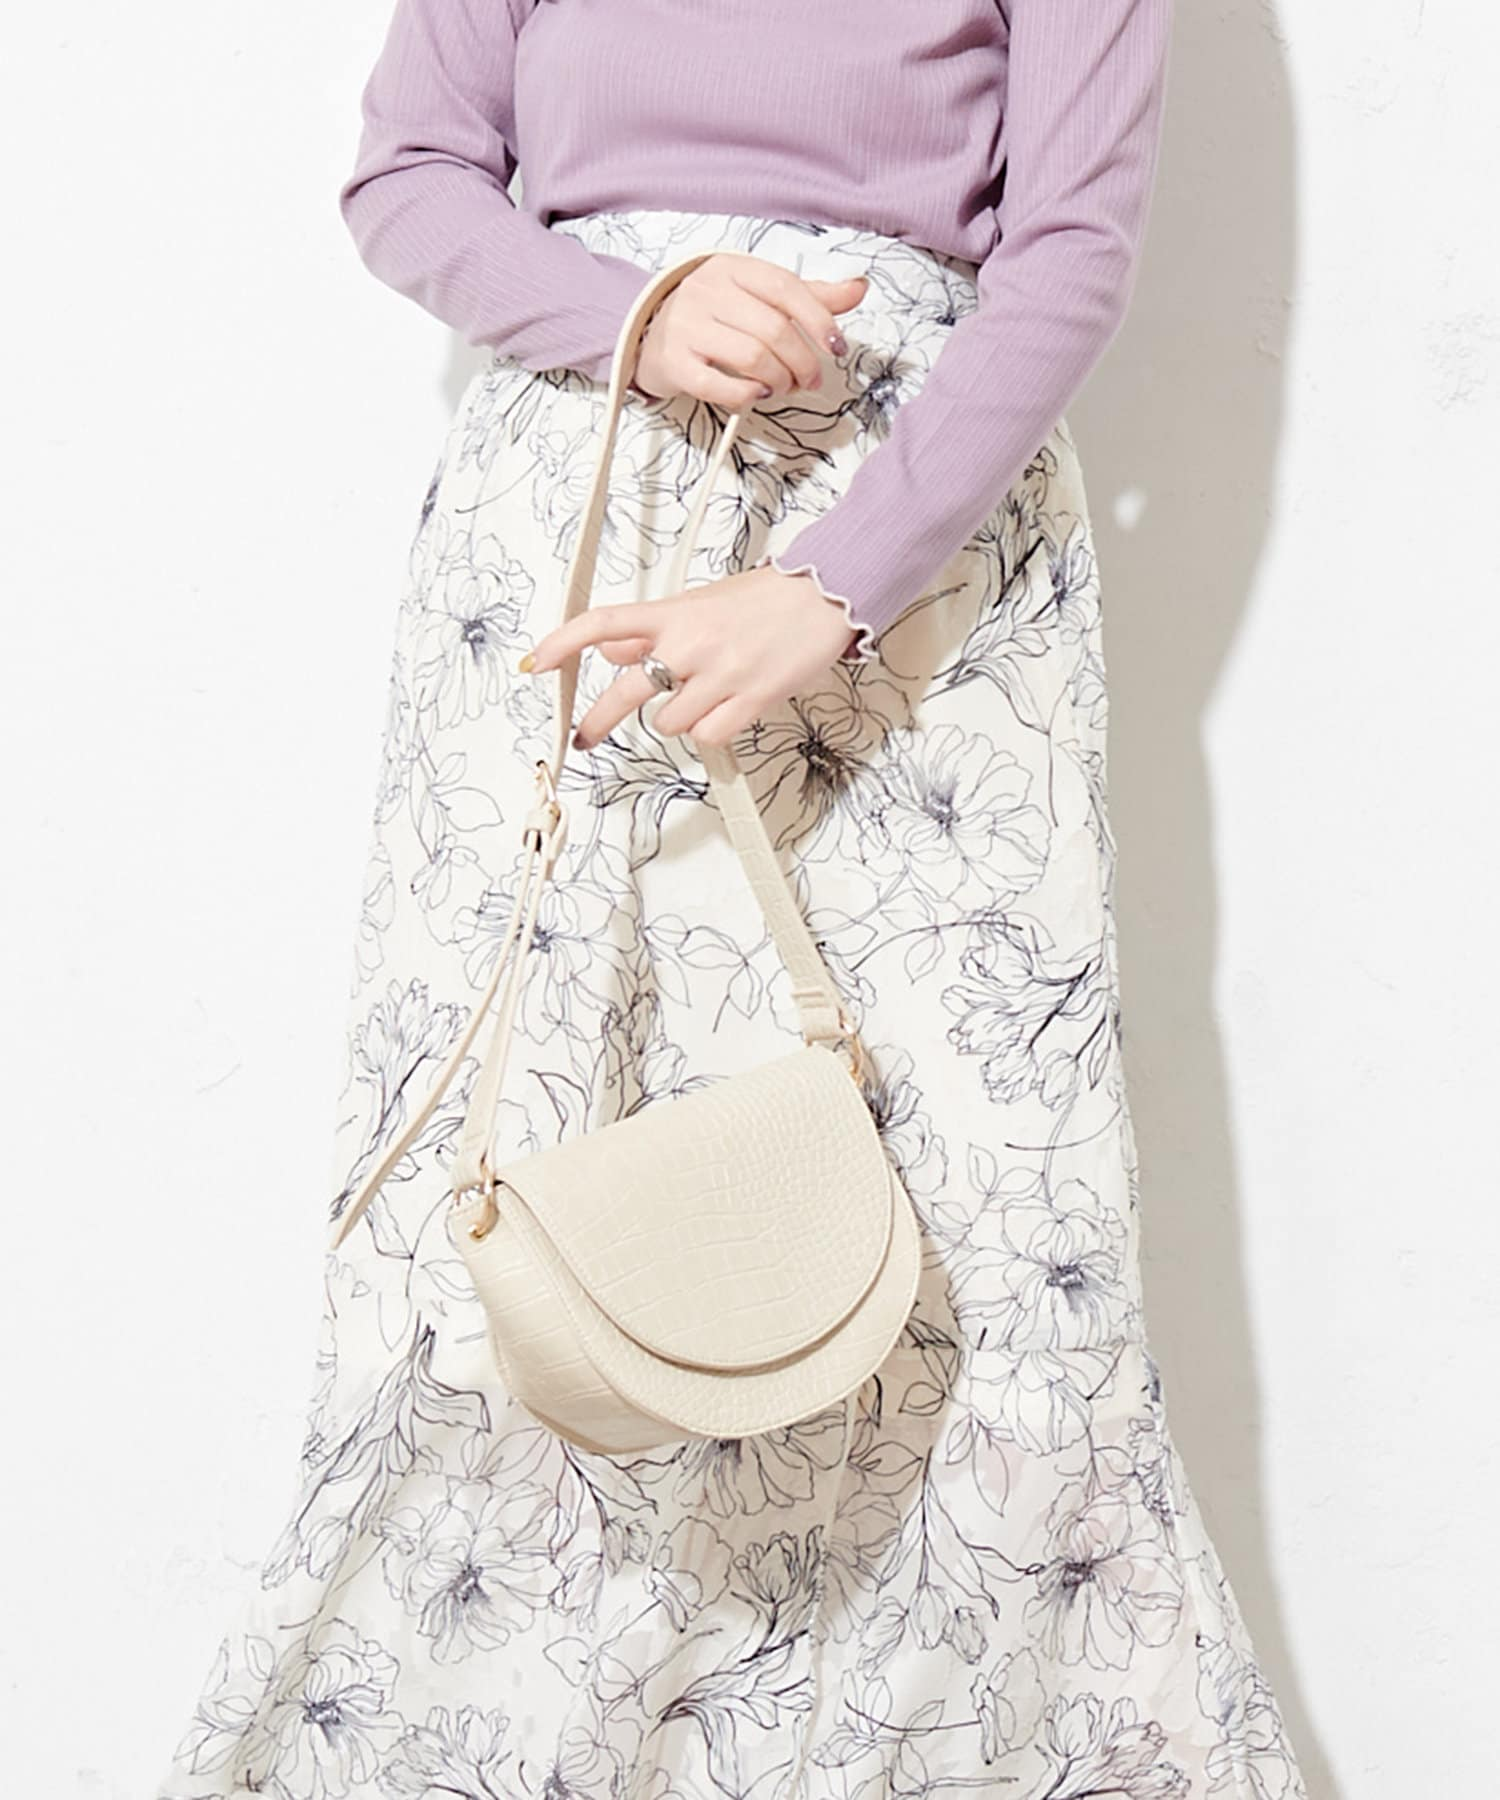 natural couture(ナチュラルクチュール) レディース エコバッグ入れパス付きハーフムーンバッグ アイボリー